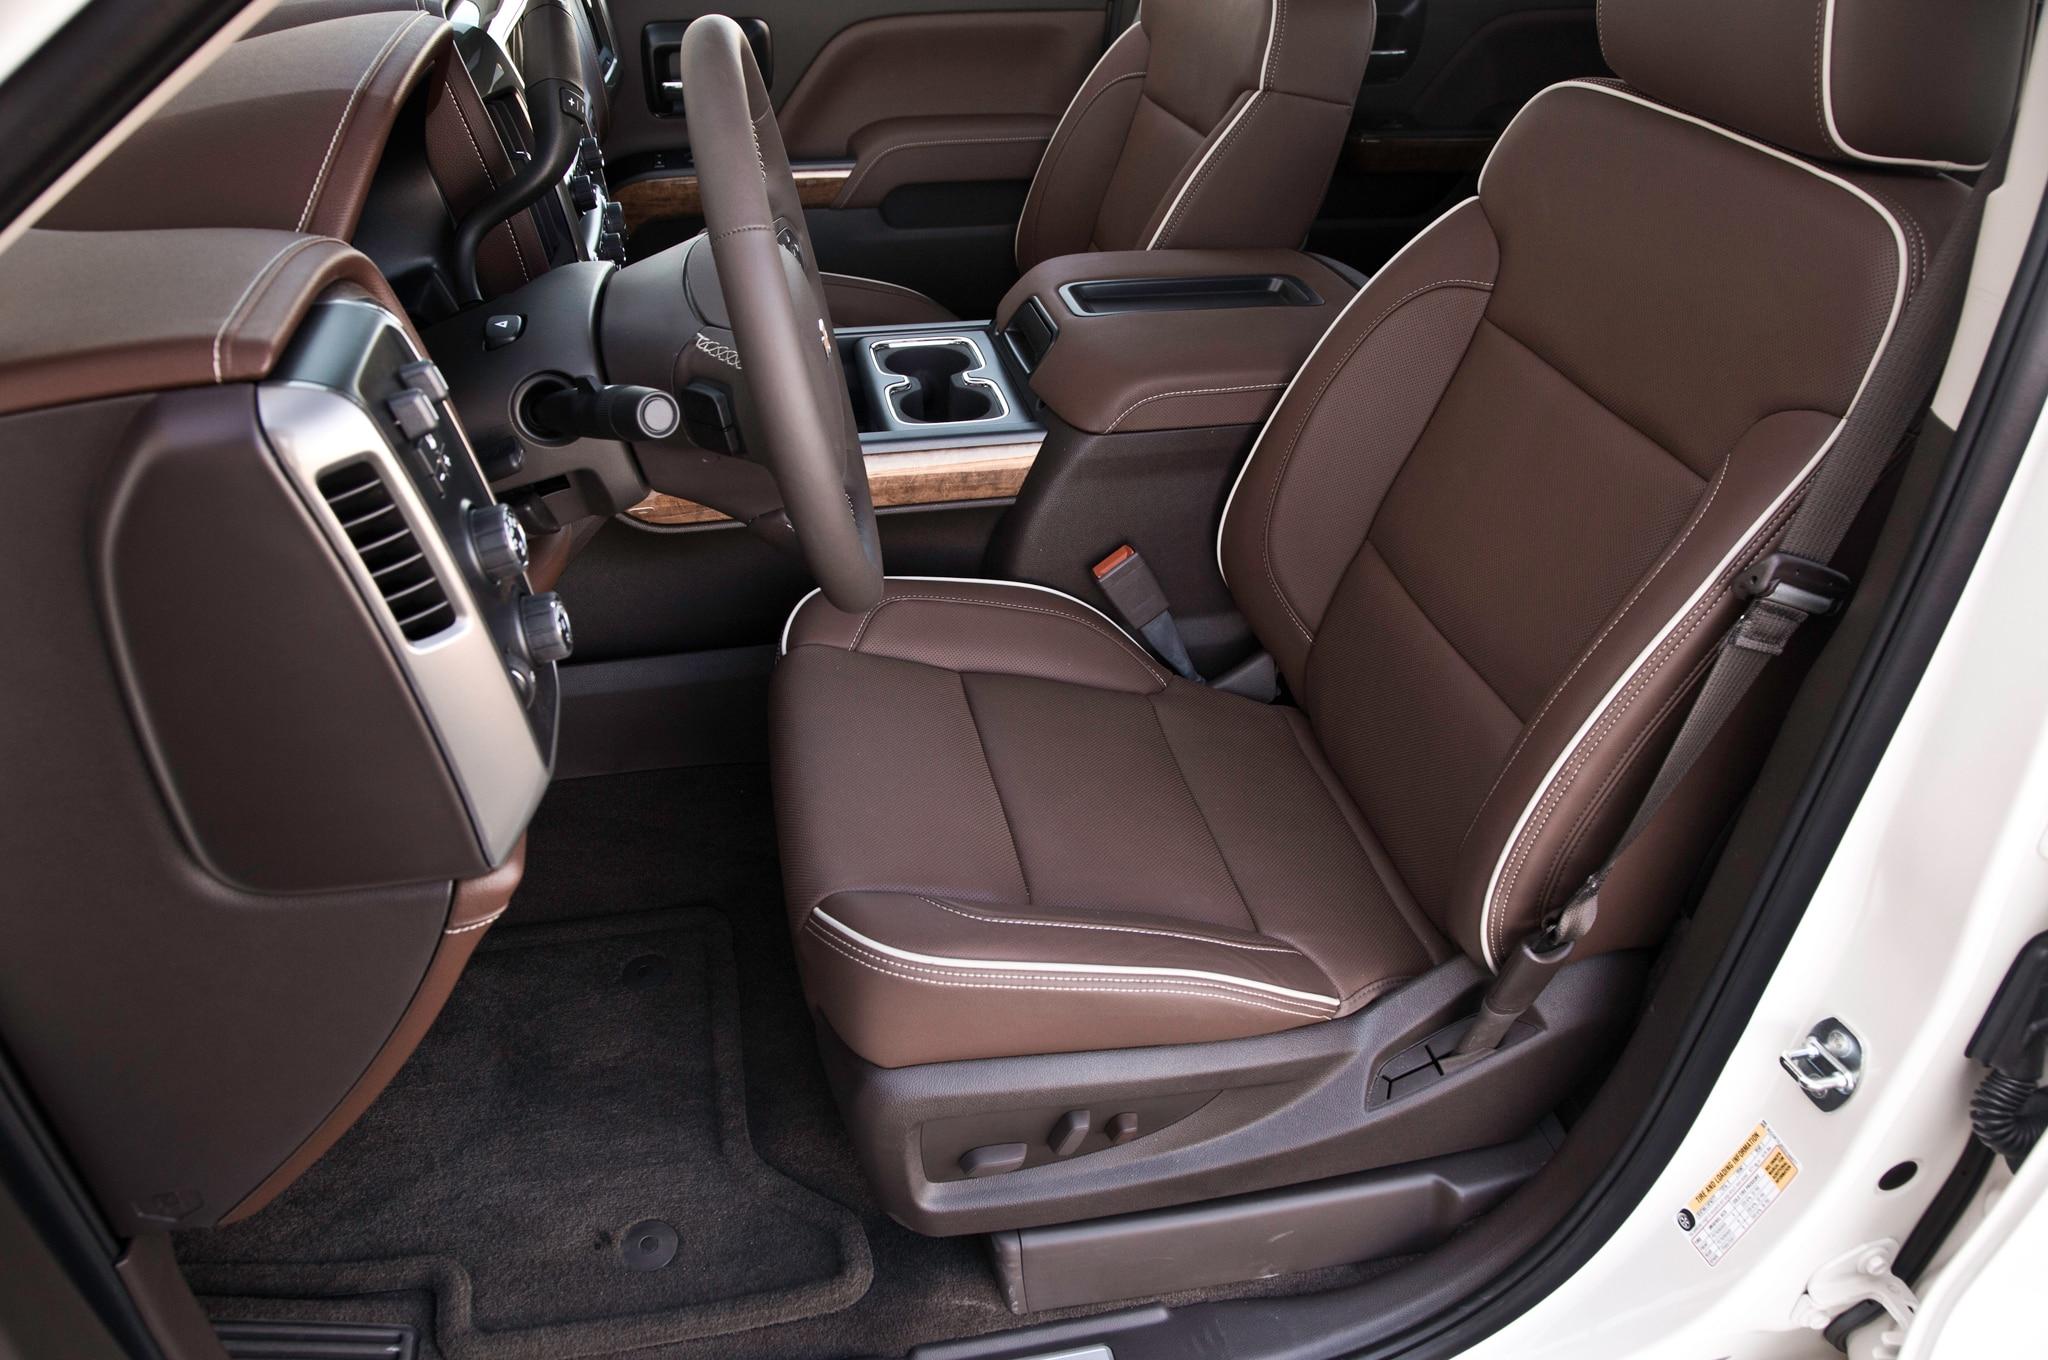 2014 Chevrolet Silverado High Country 4x4 First Test ...